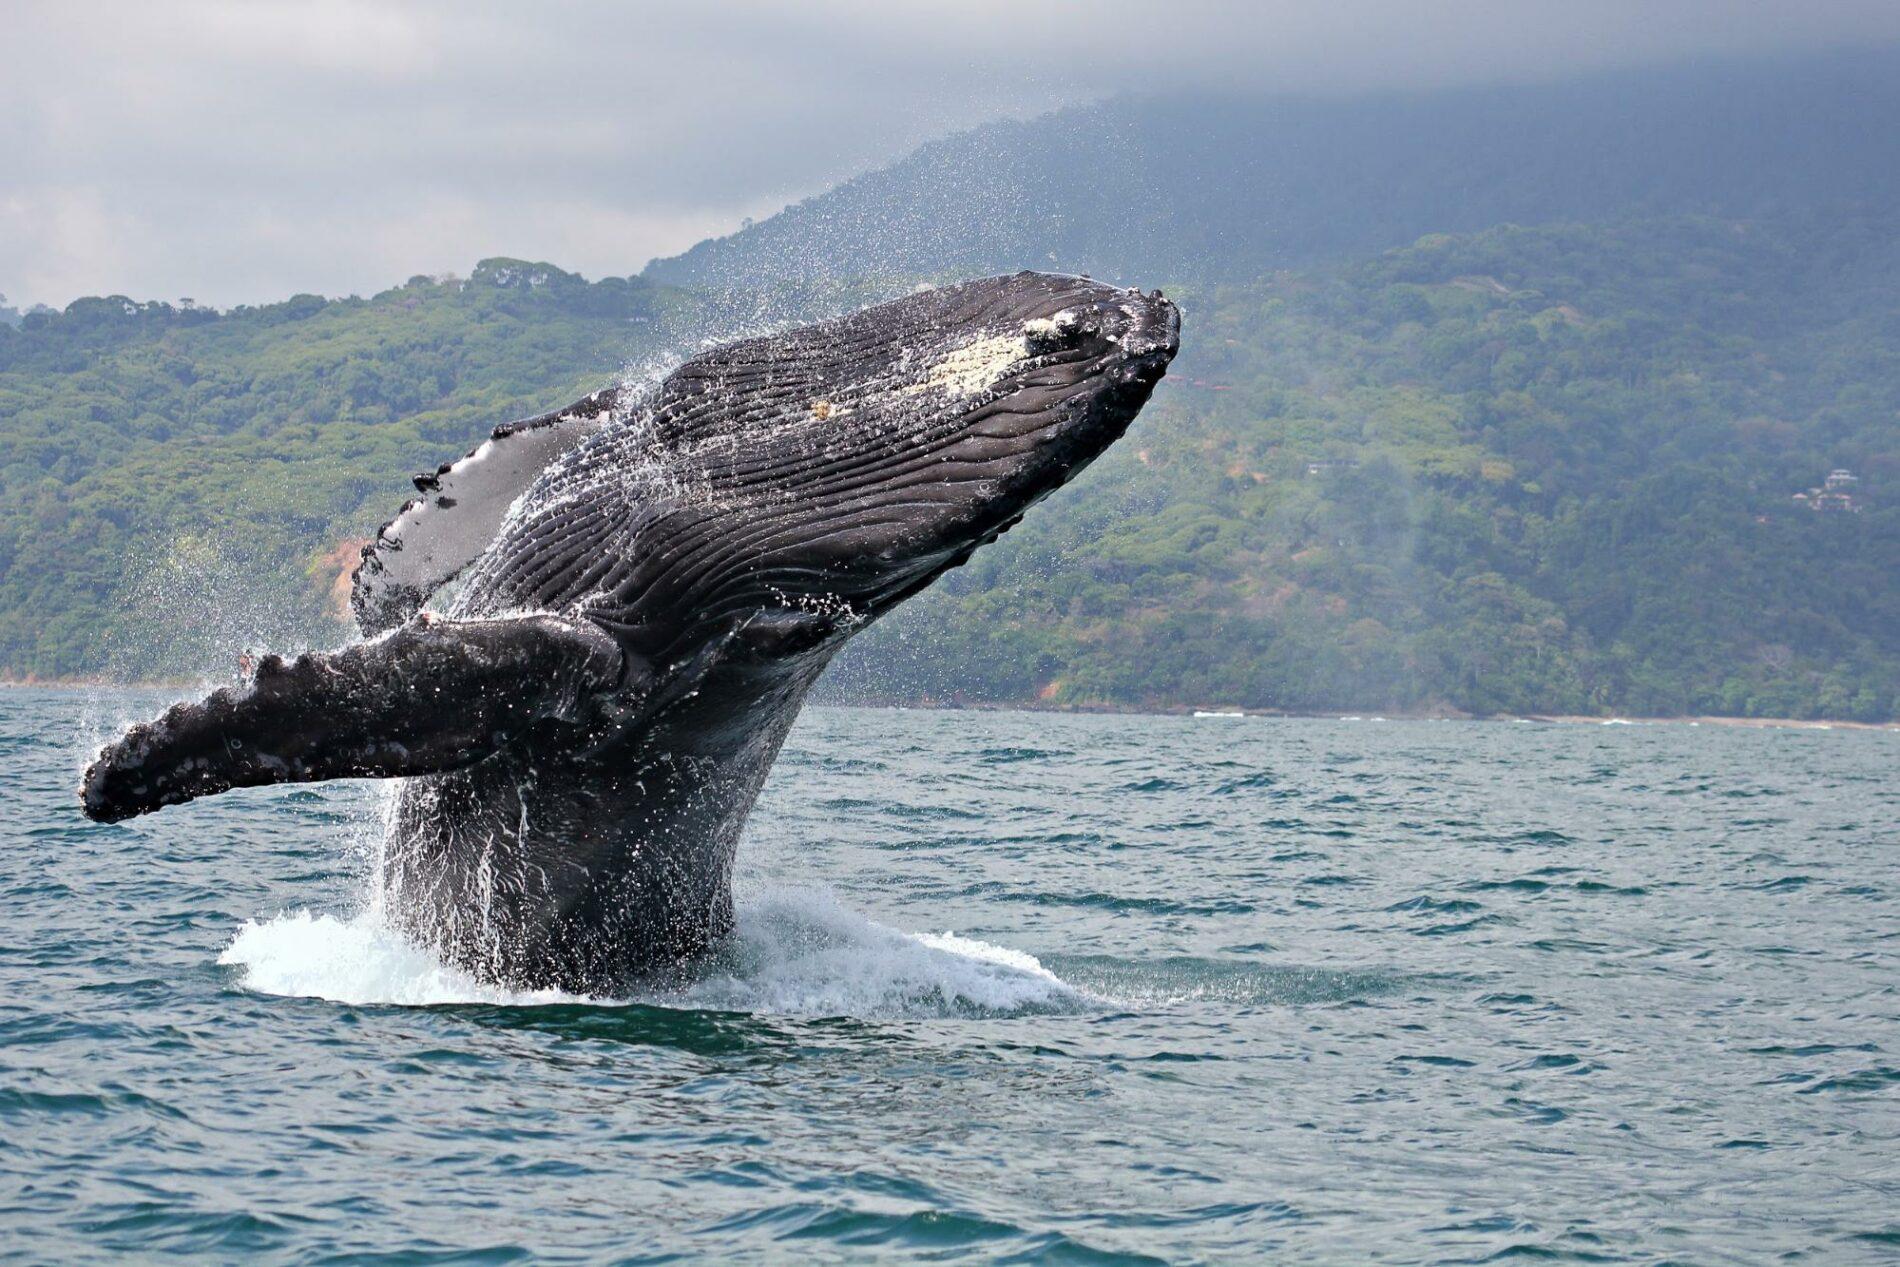 Humpback Whale breaching in the Pearl Islands, Panama